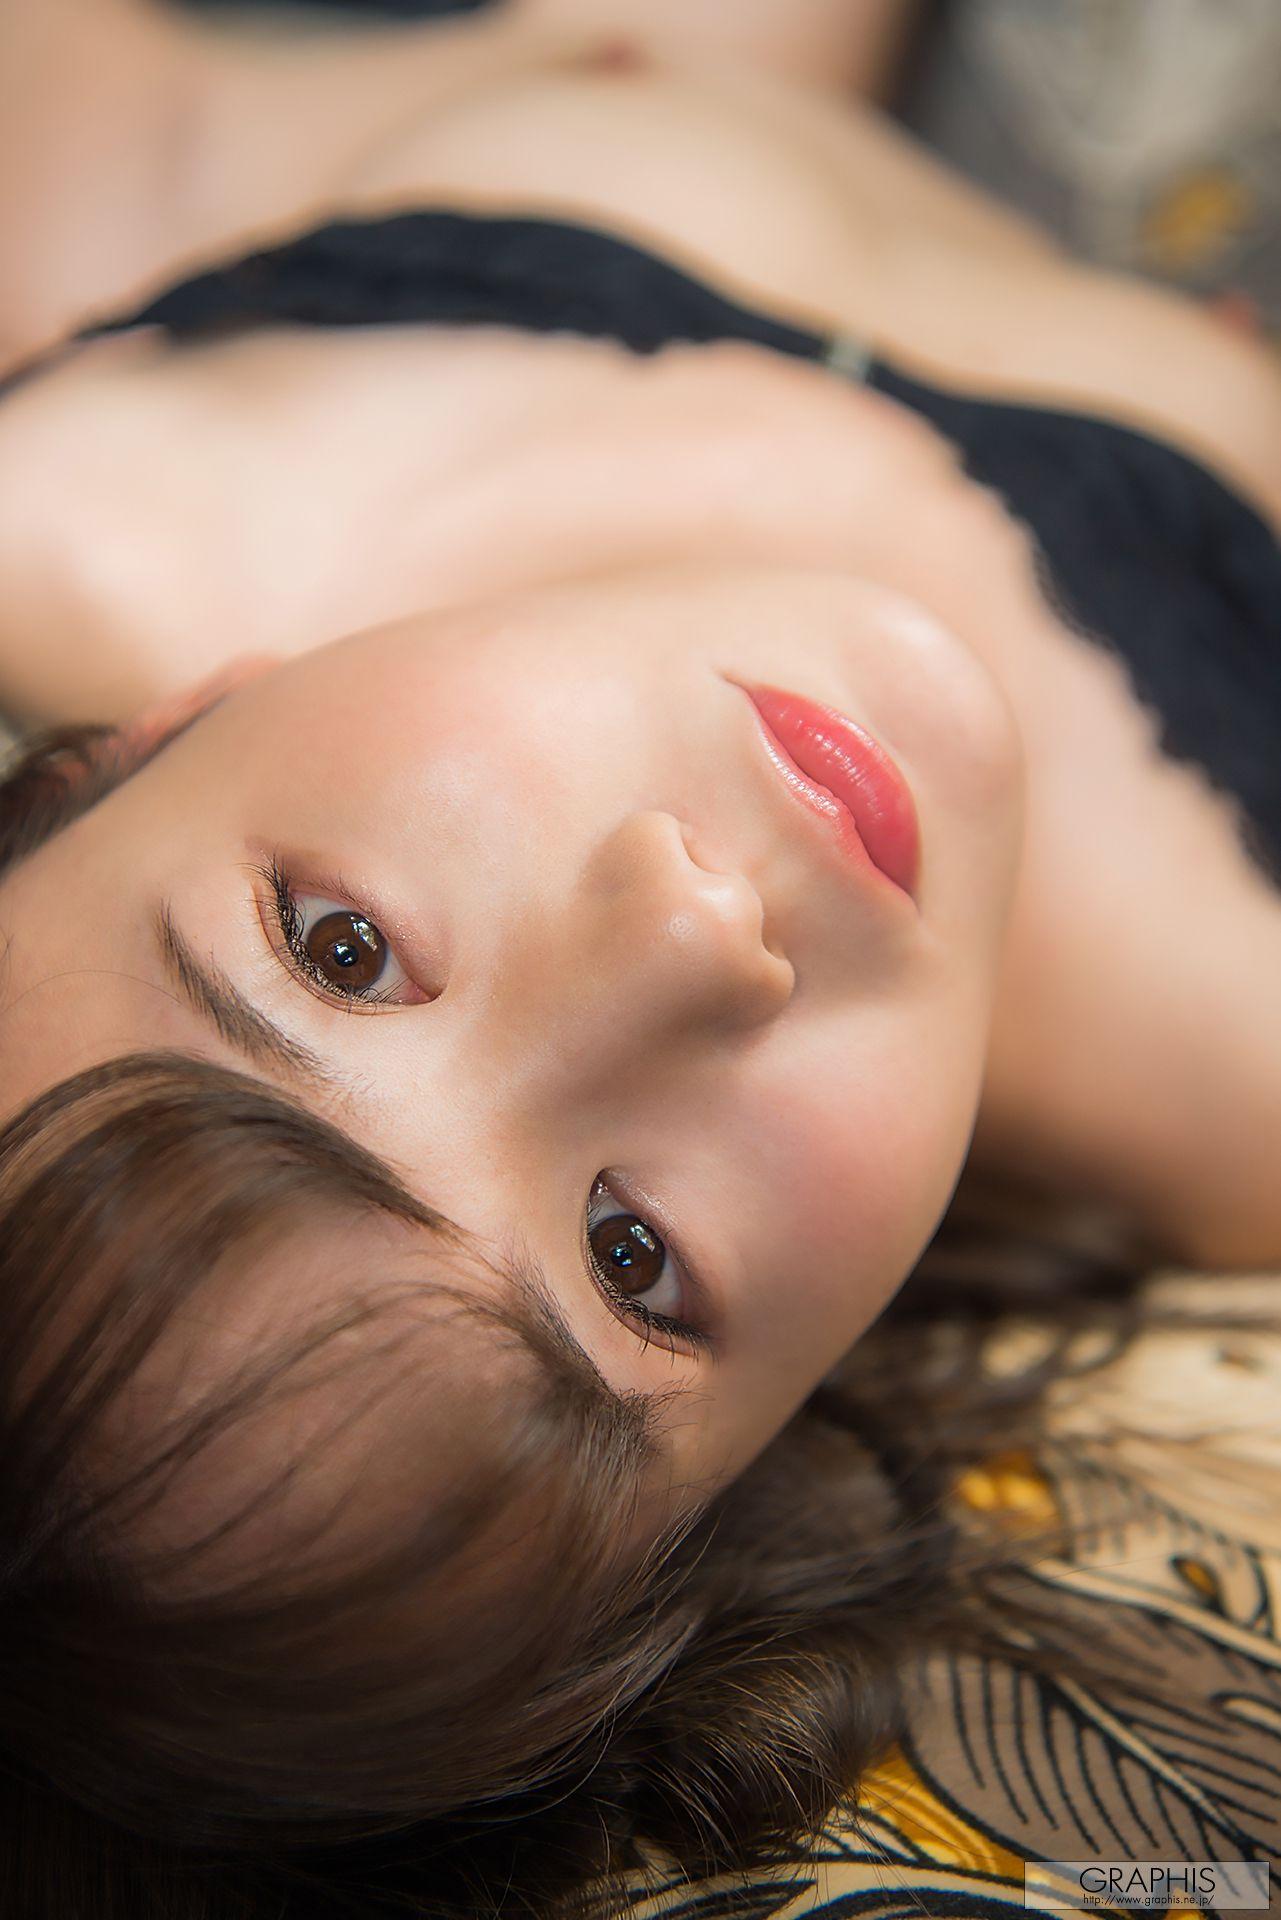 VOL.429 [Graphis]女艺人:坂道美琉(坂道みる)超高清写真套图(19P)